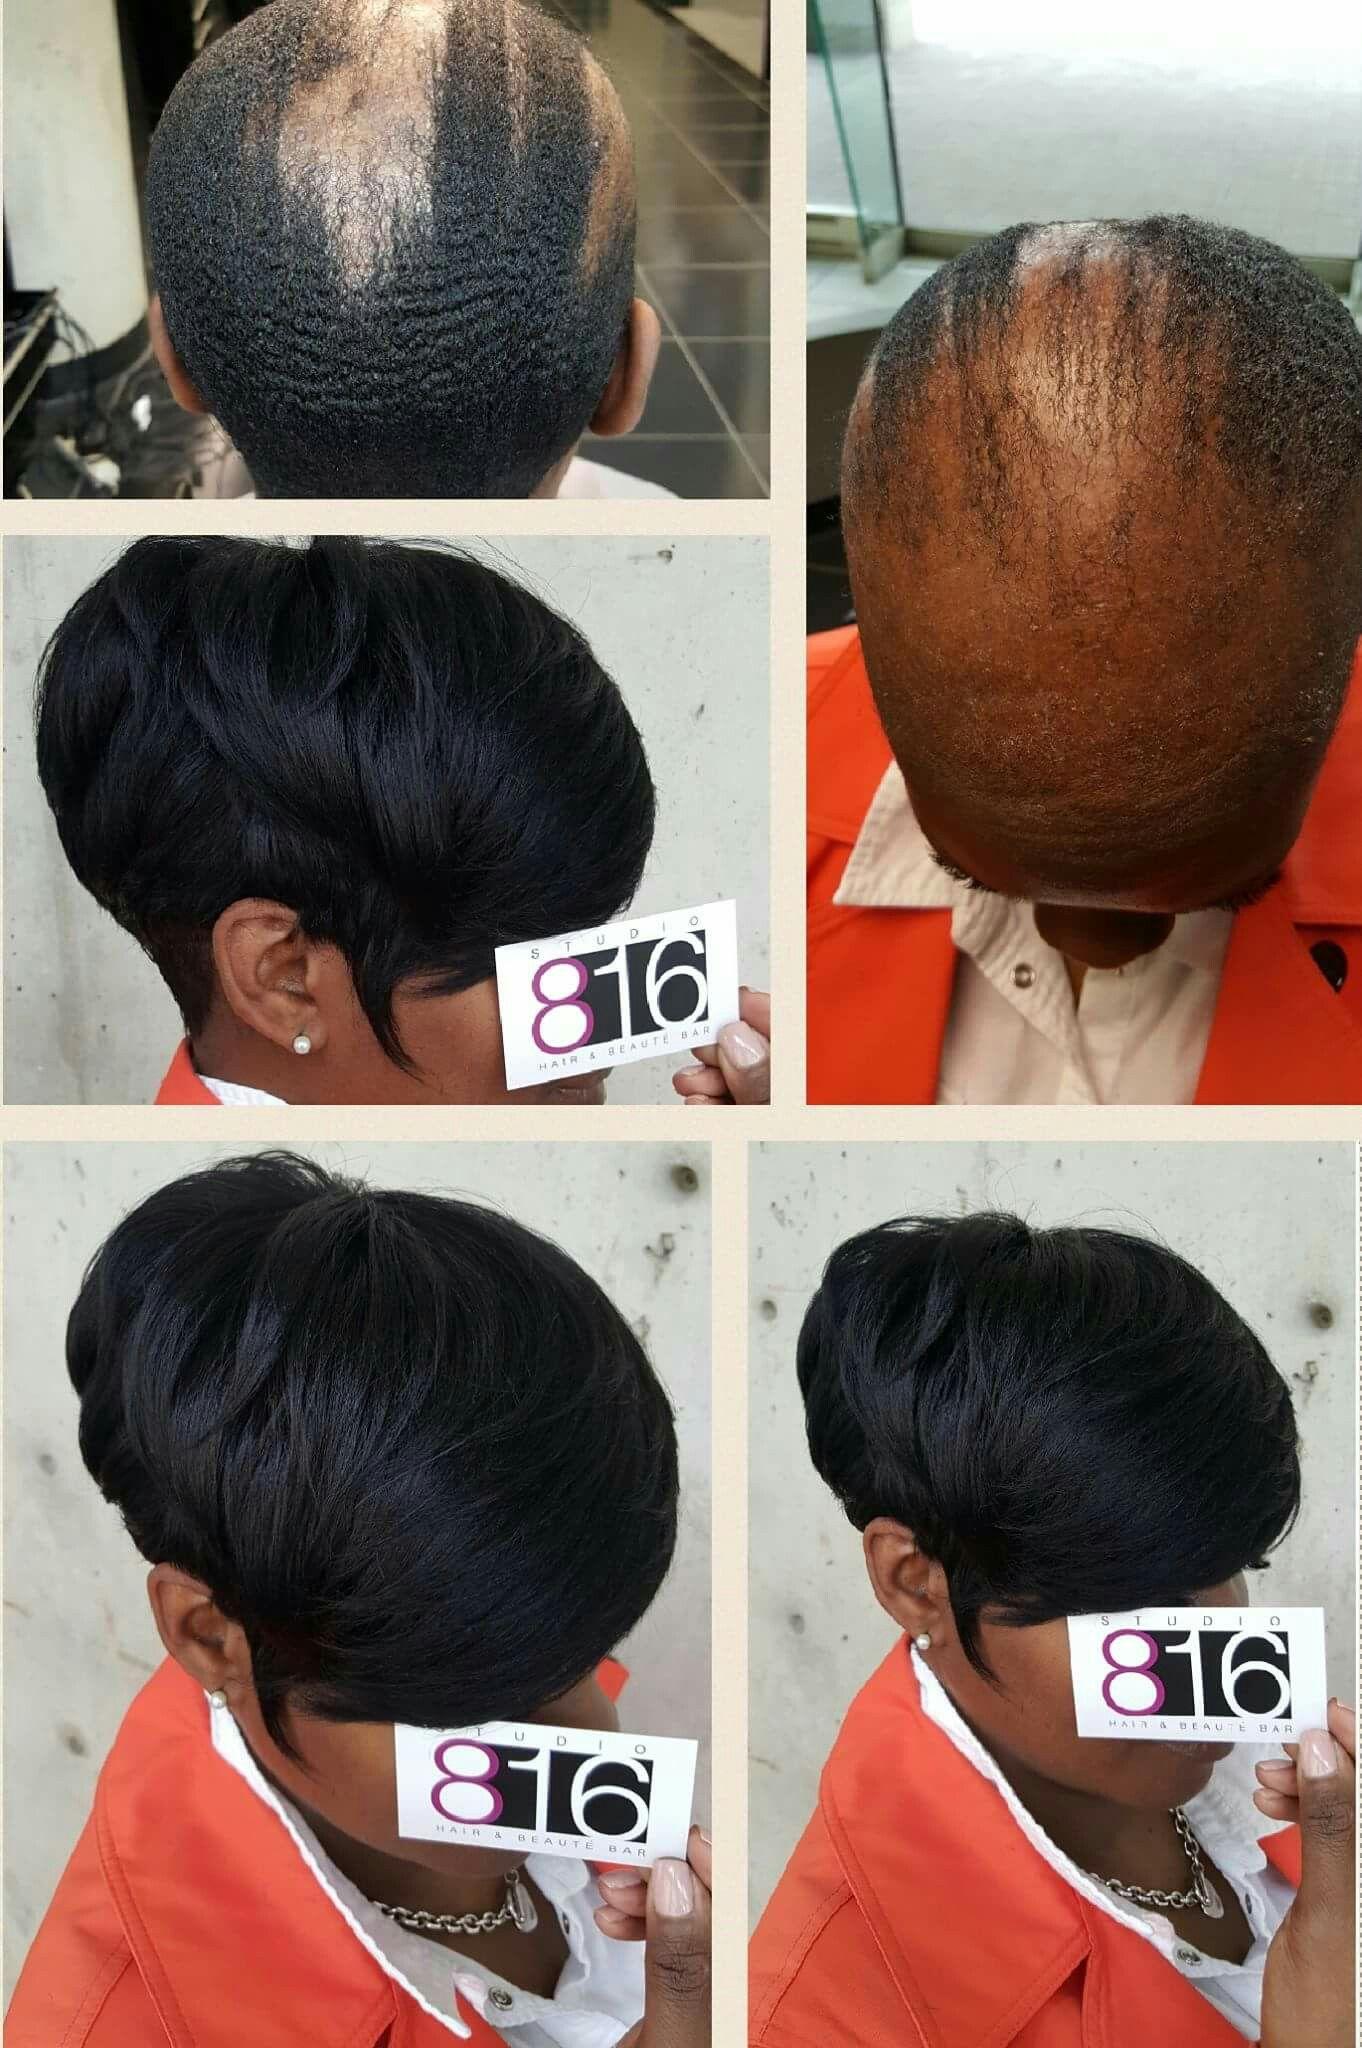 pin by pamela maddox on pams salon | short hair cuts, quick